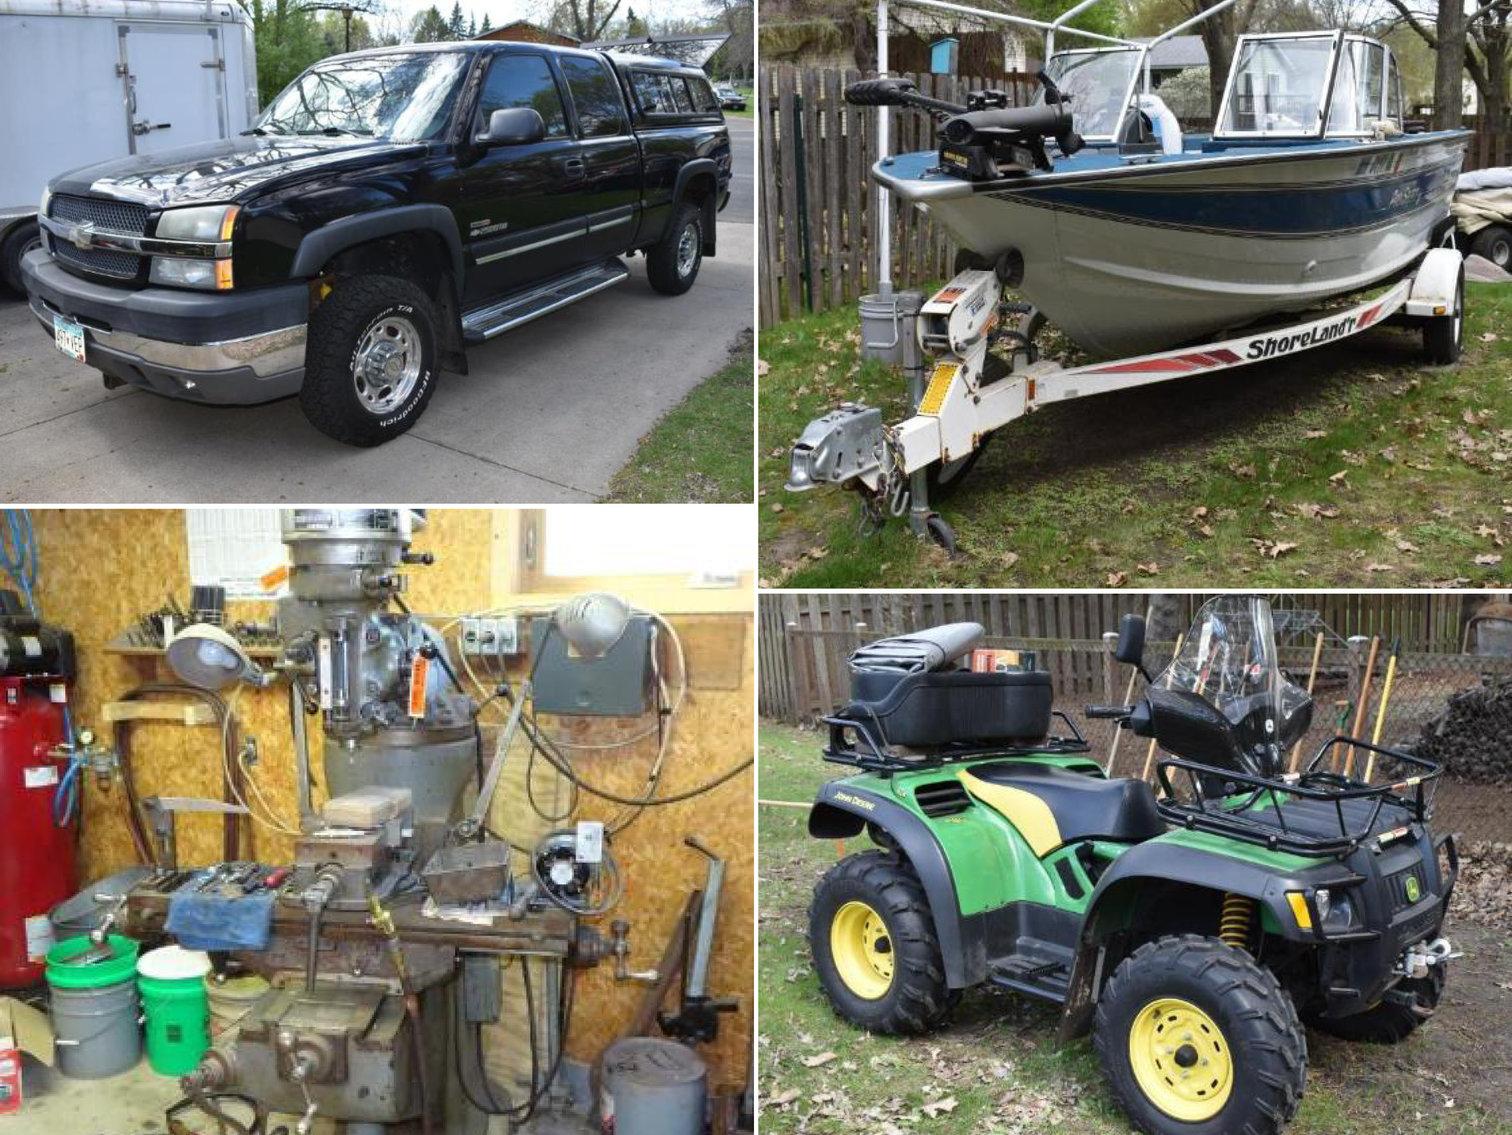 Downsizing Phase 1: 2003 Chevrolet Silverado, Boat, Bridgeport Mill, Southbend Lathe, Equipment & Tools